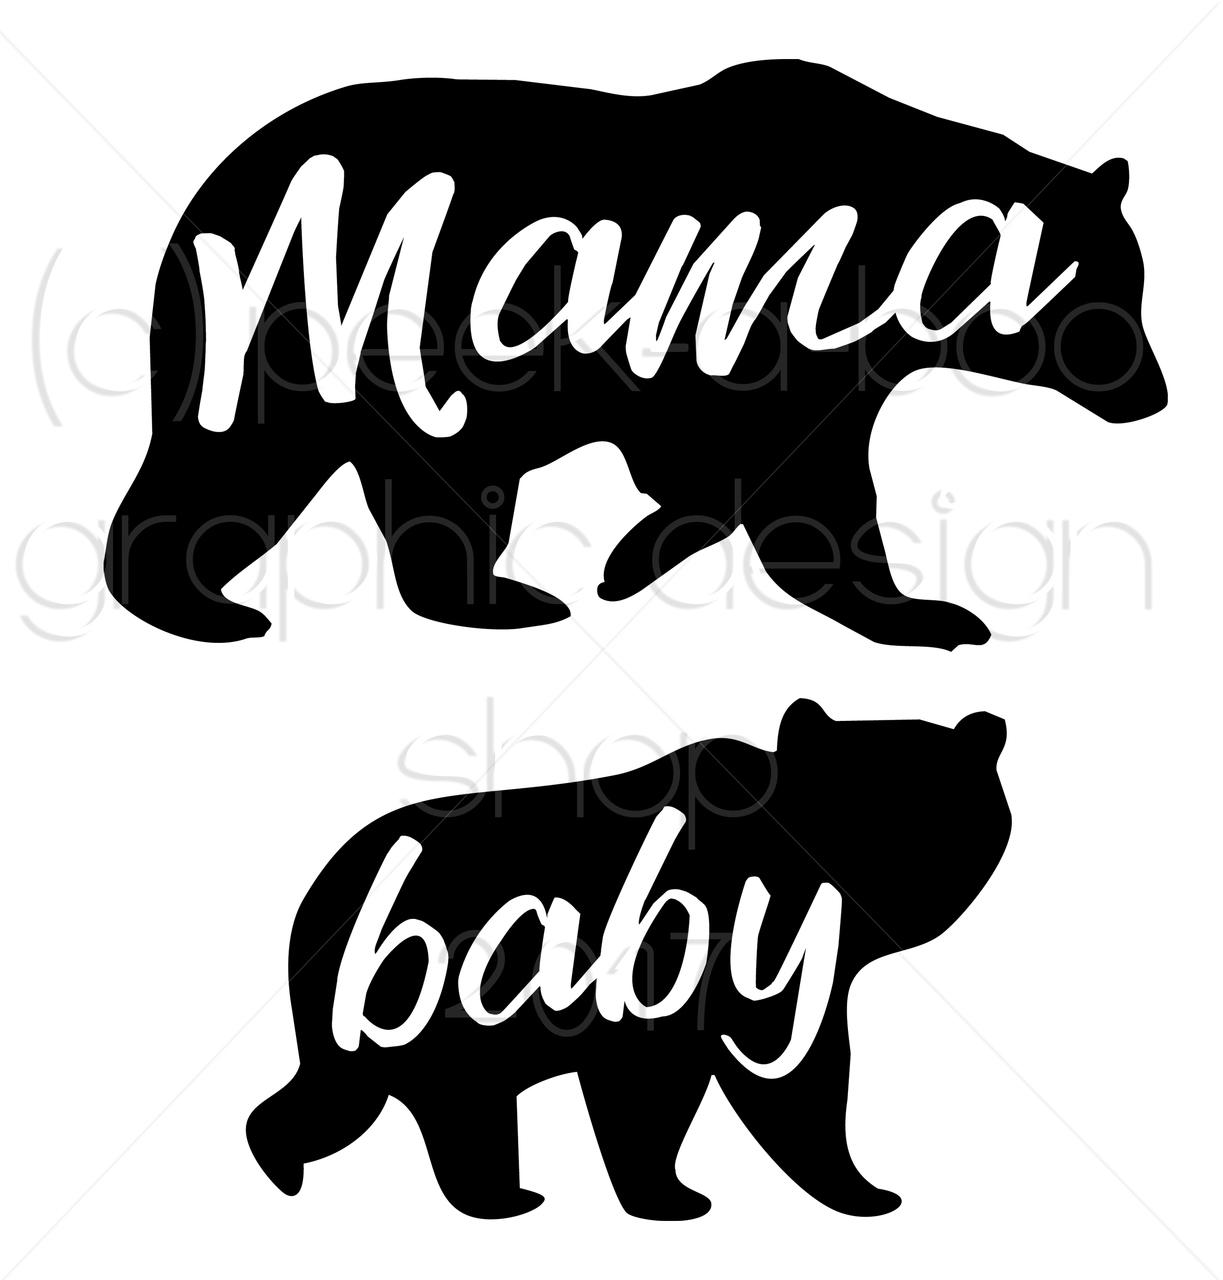 Mama and baby bear clipart clip freeuse stock Mama Bear & Baby Bear SVG Digital Cut File clip freeuse stock